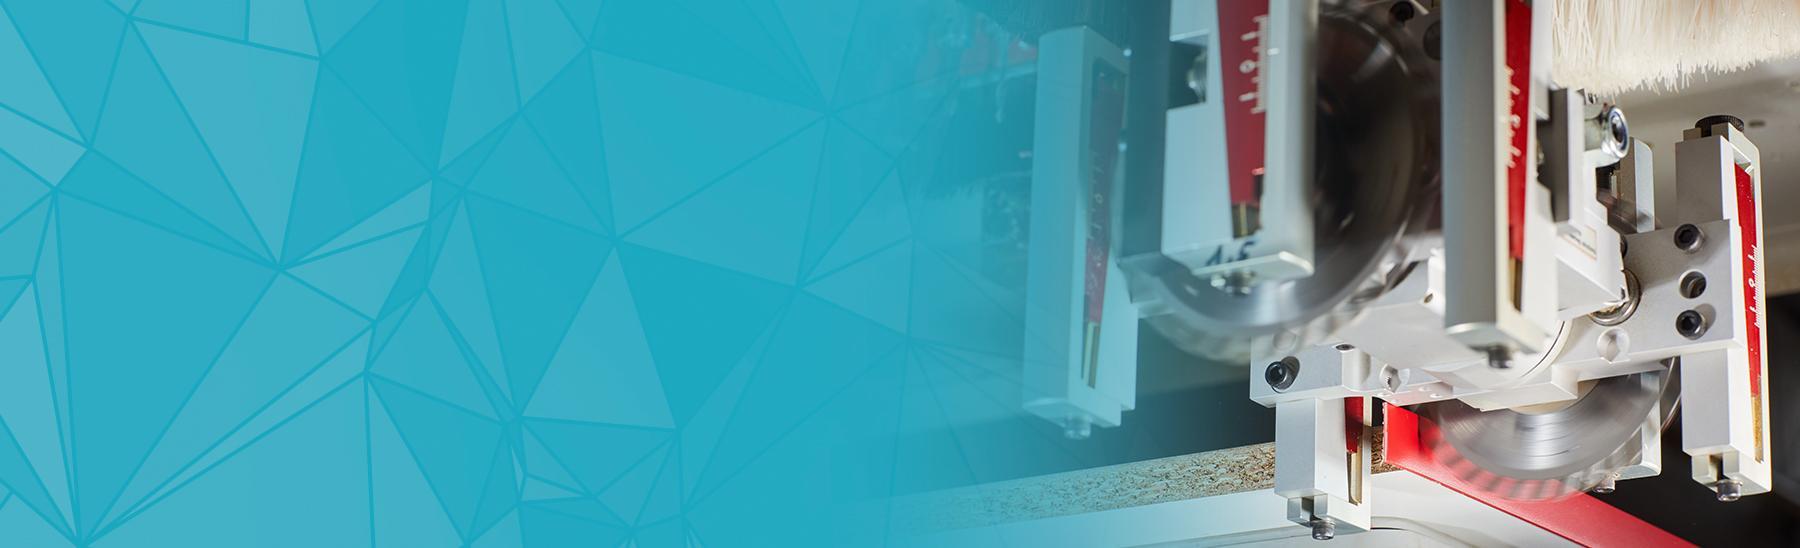 Key-Visual Magna Expo Mueblera Industrial 2019